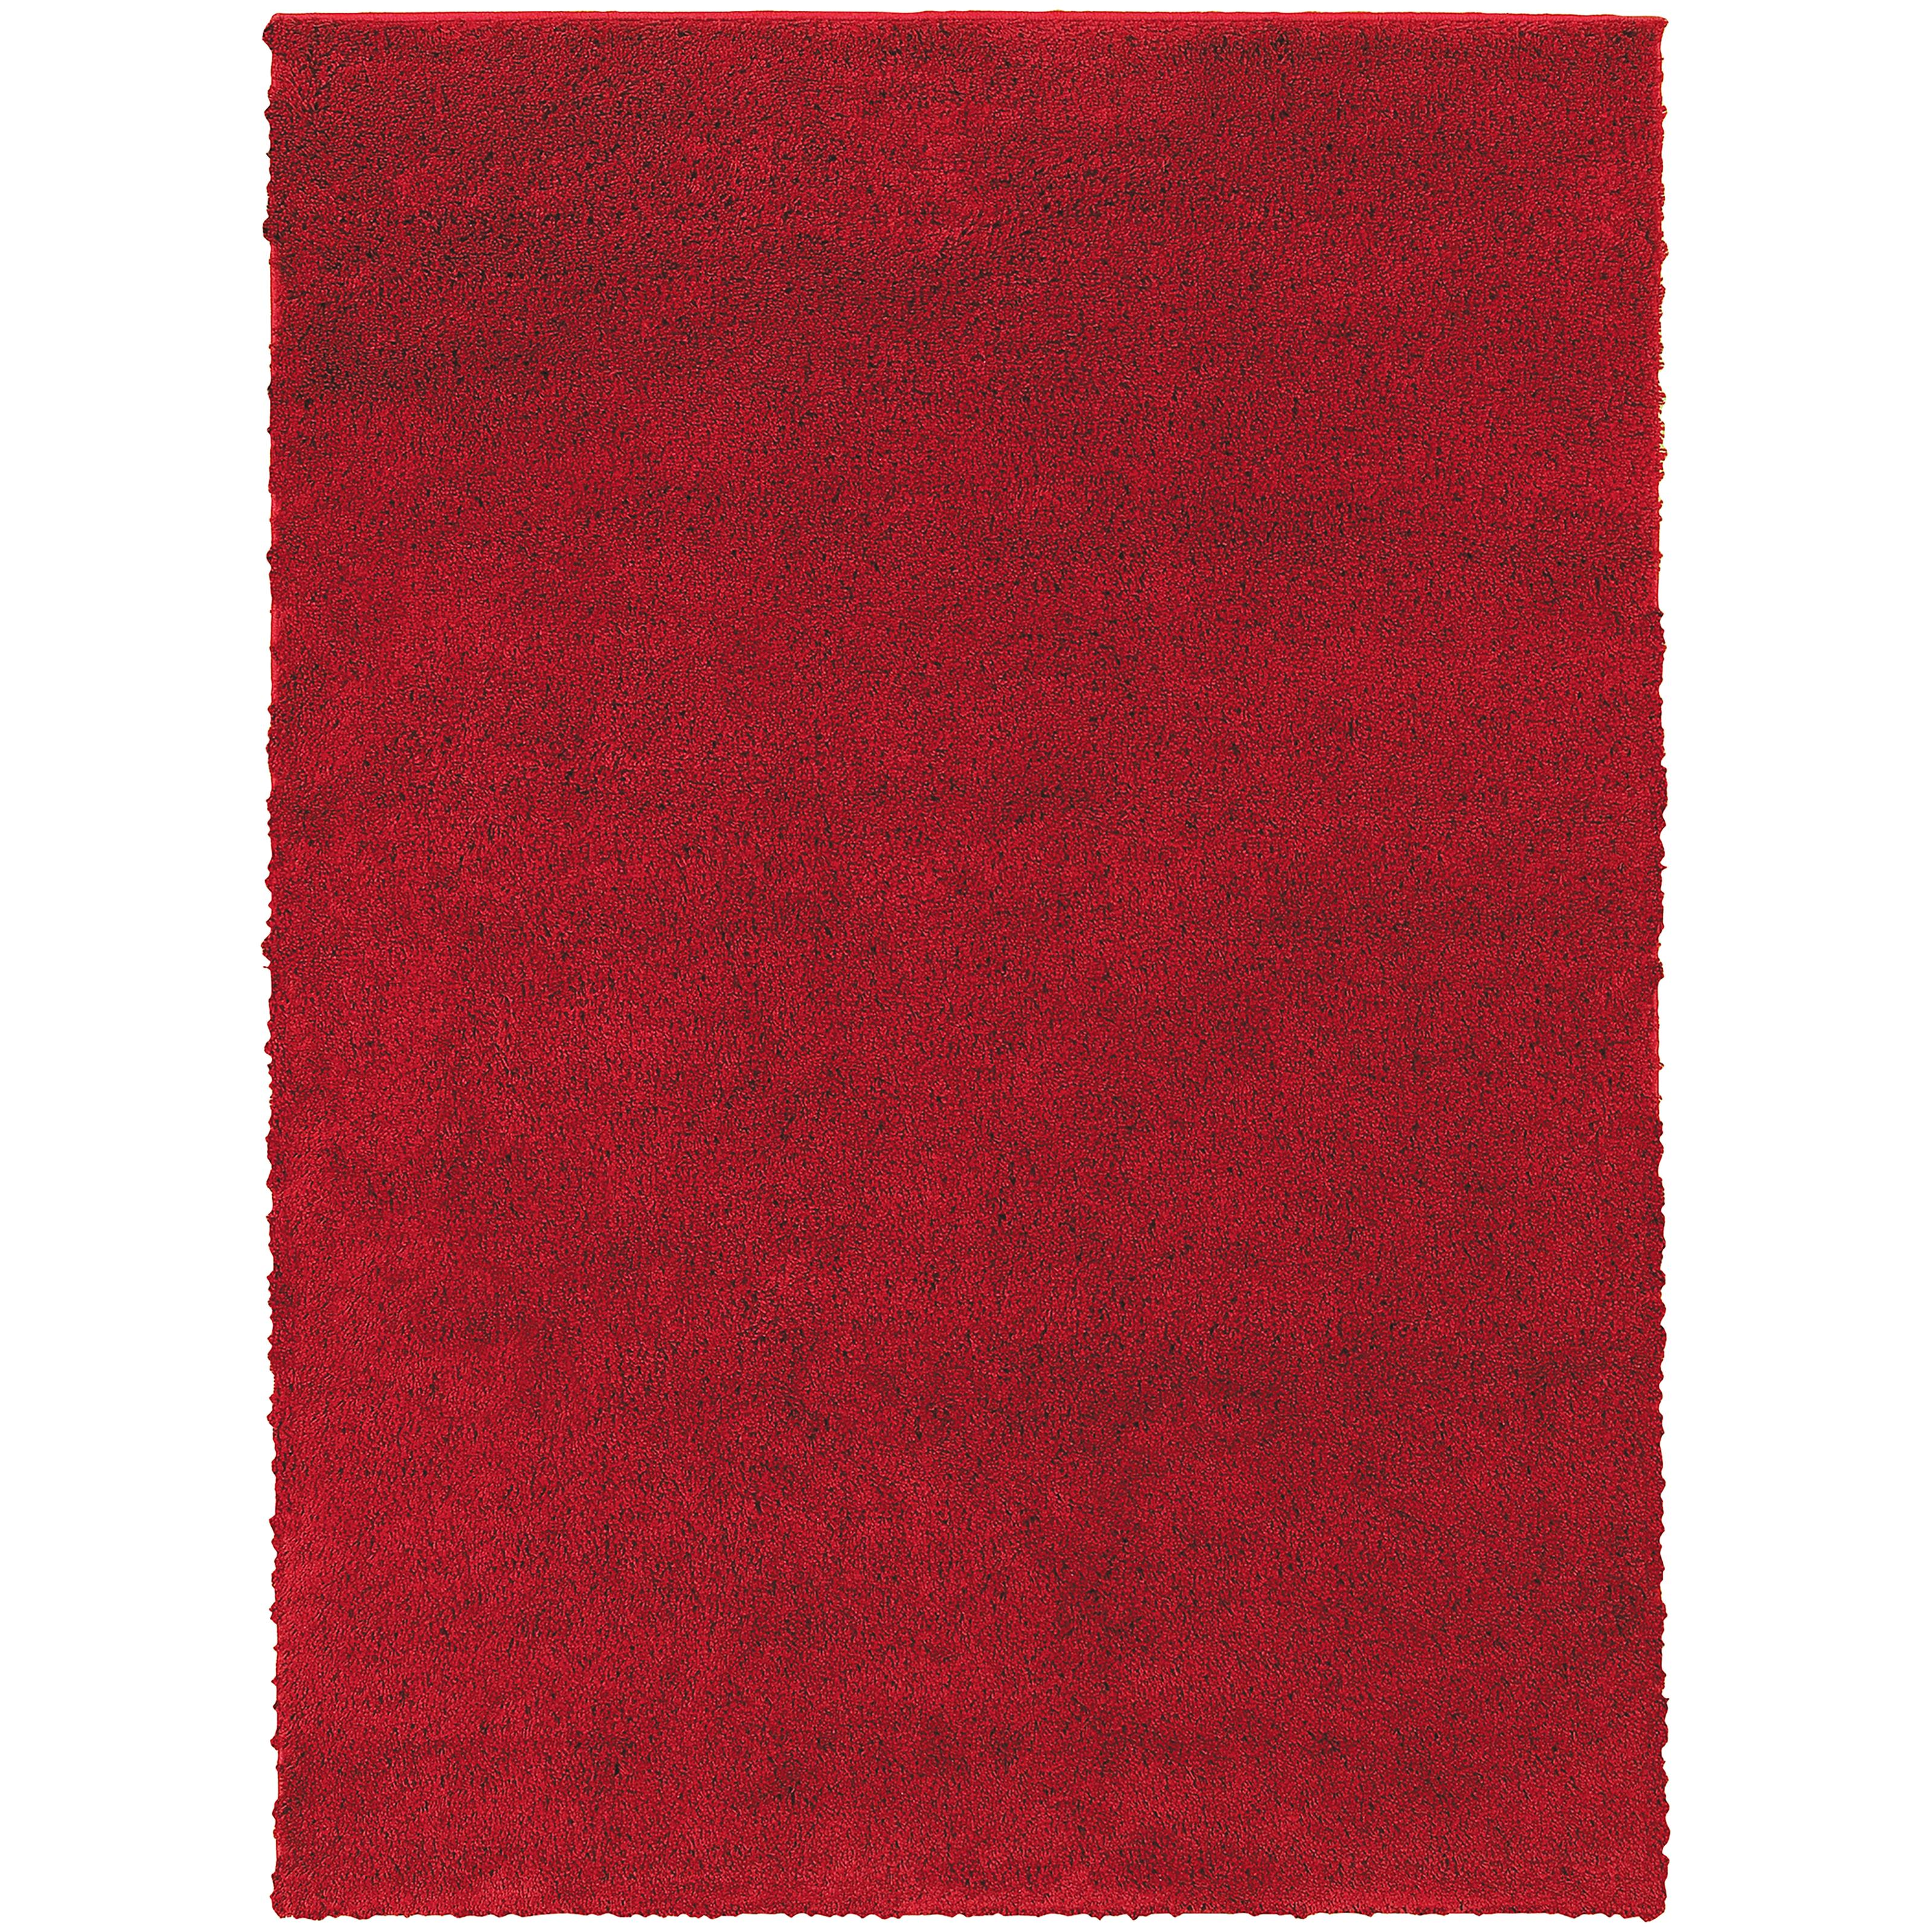 "Oriental Weavers Impressions 6' 7"" X  9' 3"" Rug - Item Number: I84600200280ST"